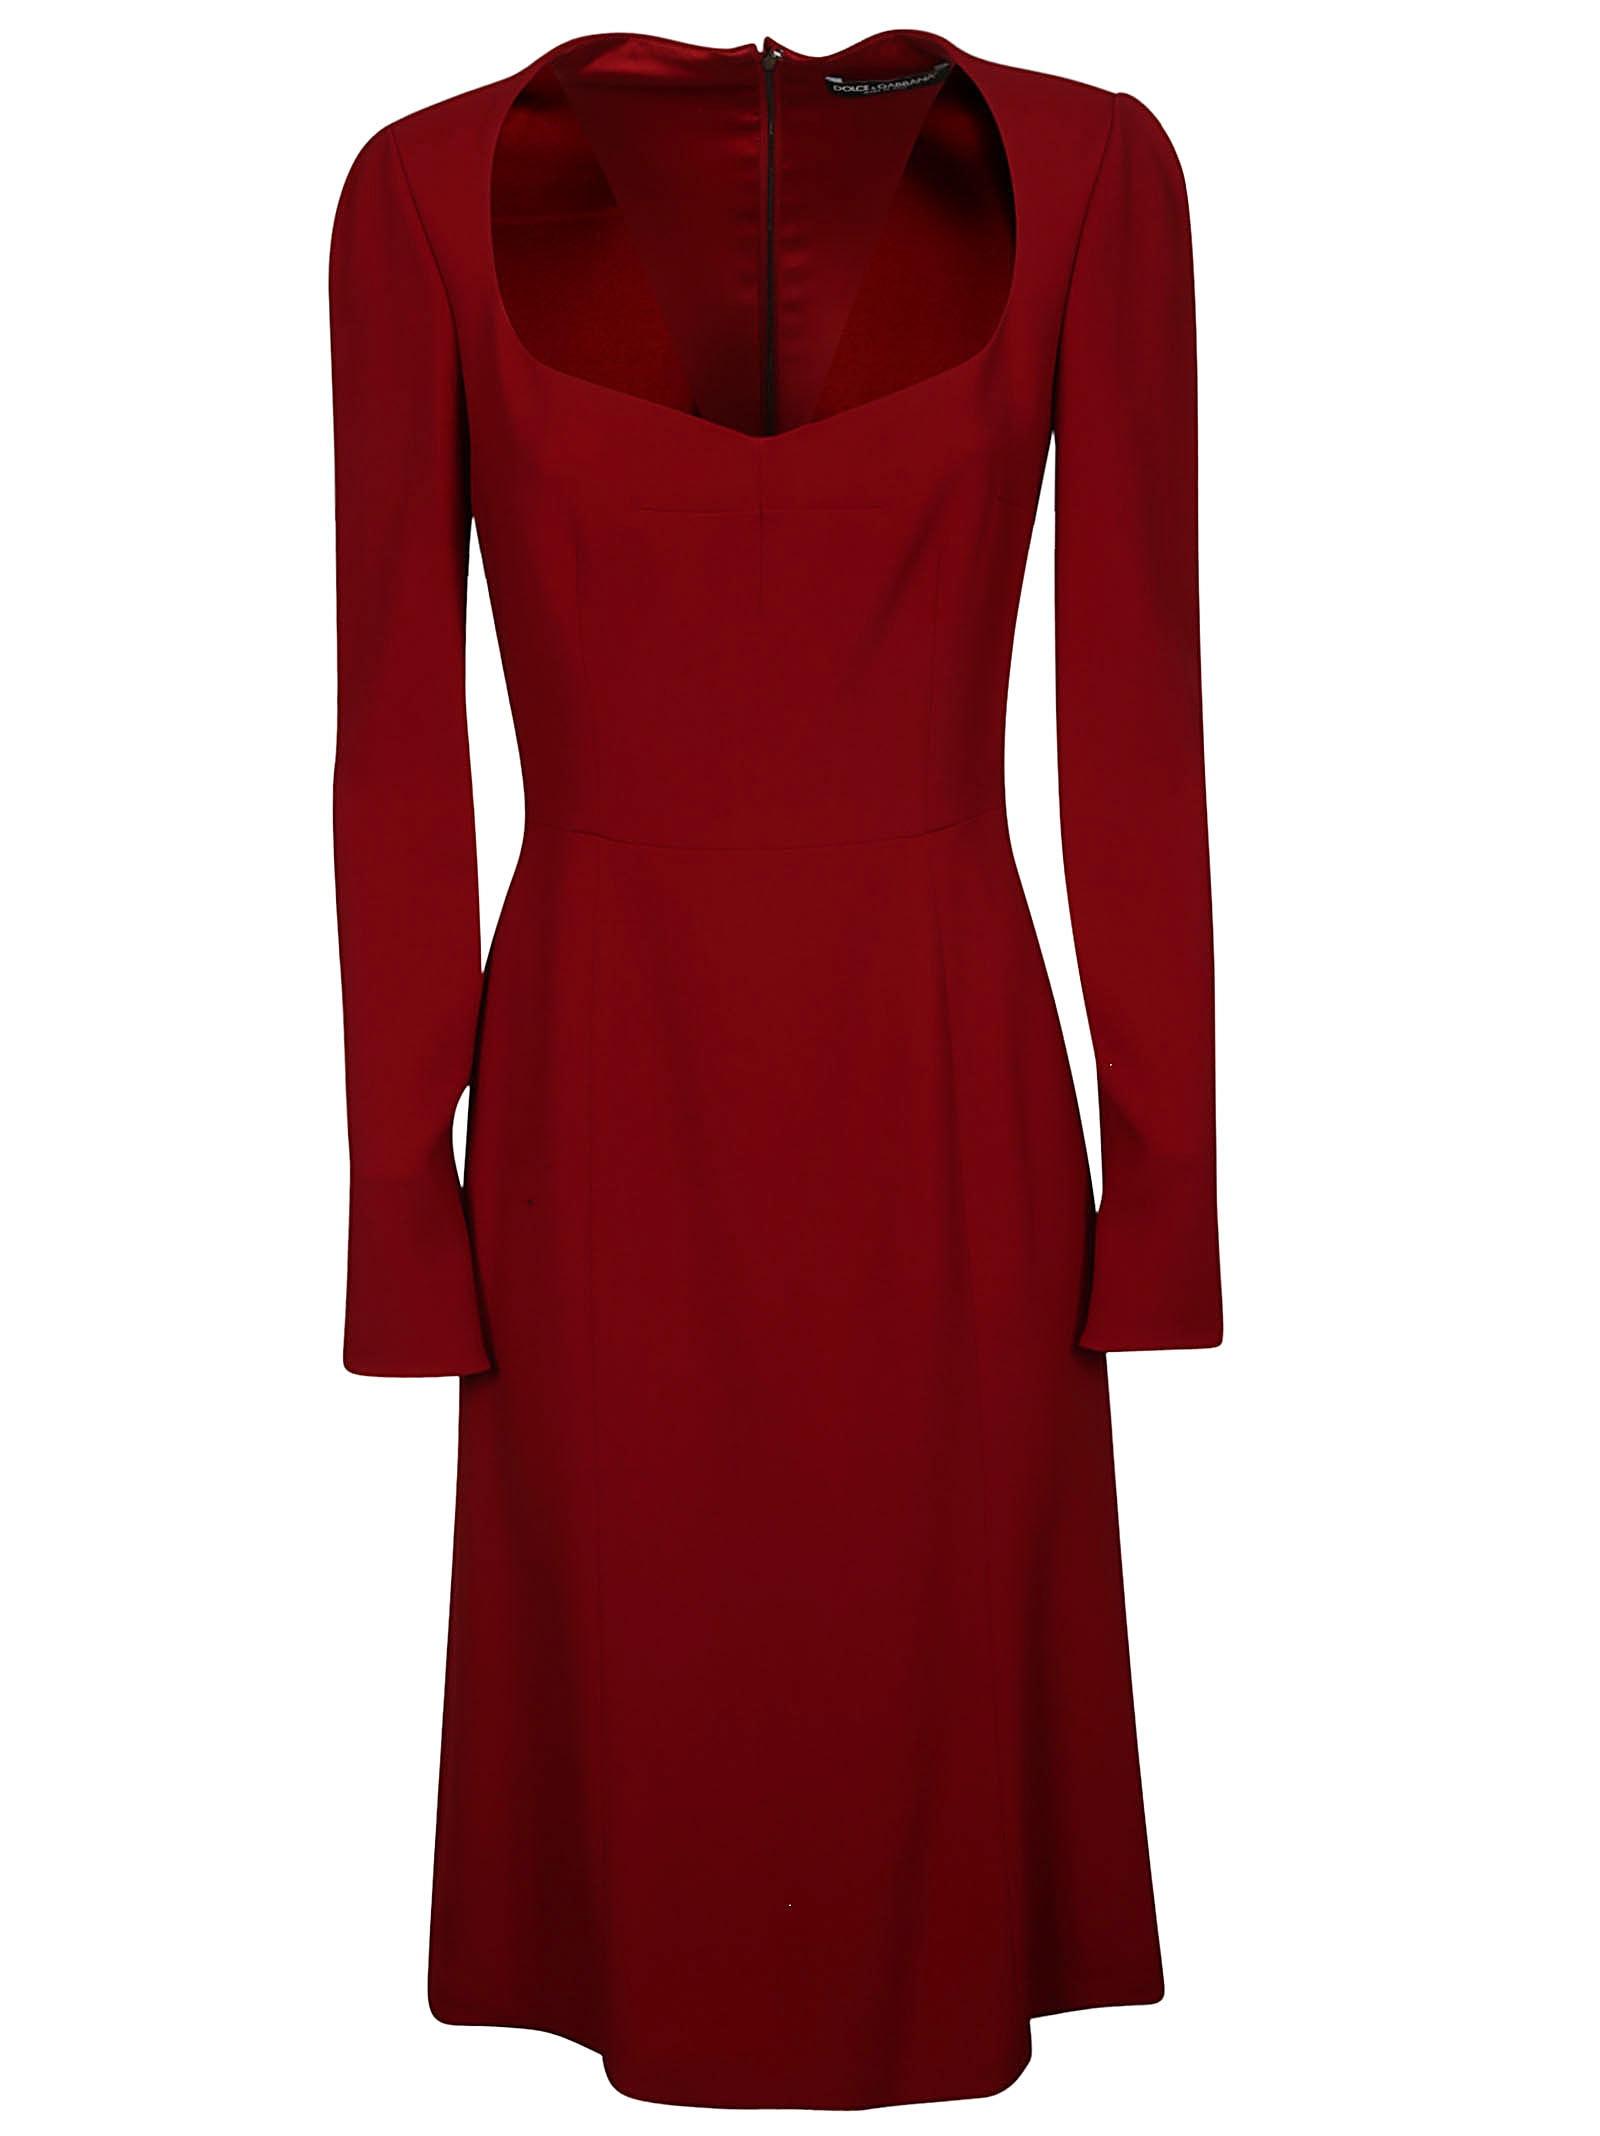 Photo of  Dolce & Gabbana Rear Zipped Dress- shop Dolce & Gabbana  online sales